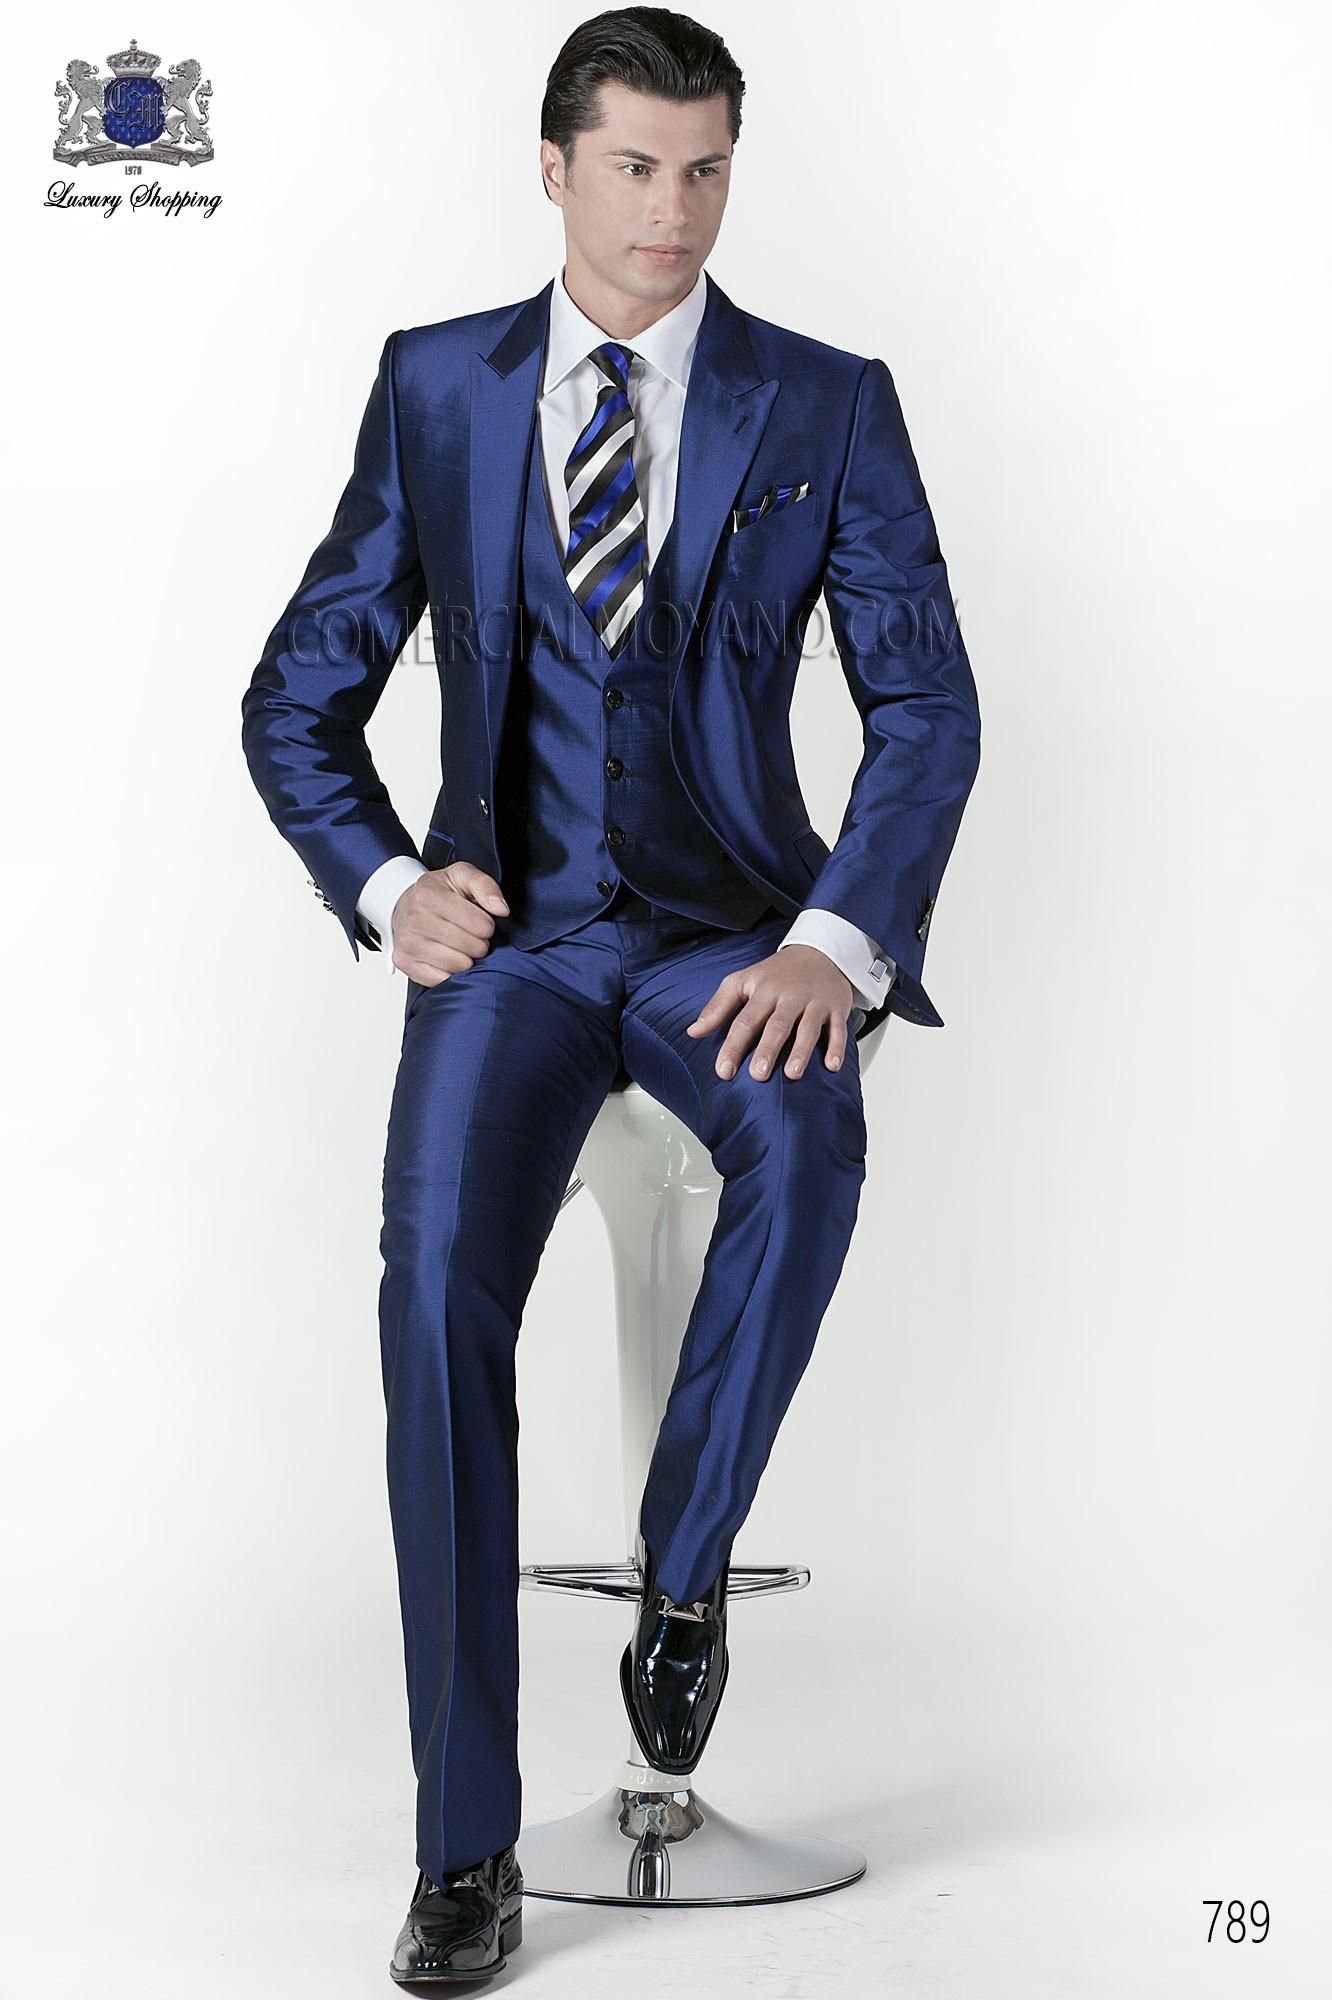 Traje de novio moderno azul modelo: 789 Ottavio Nuccio Gala colección Fashion